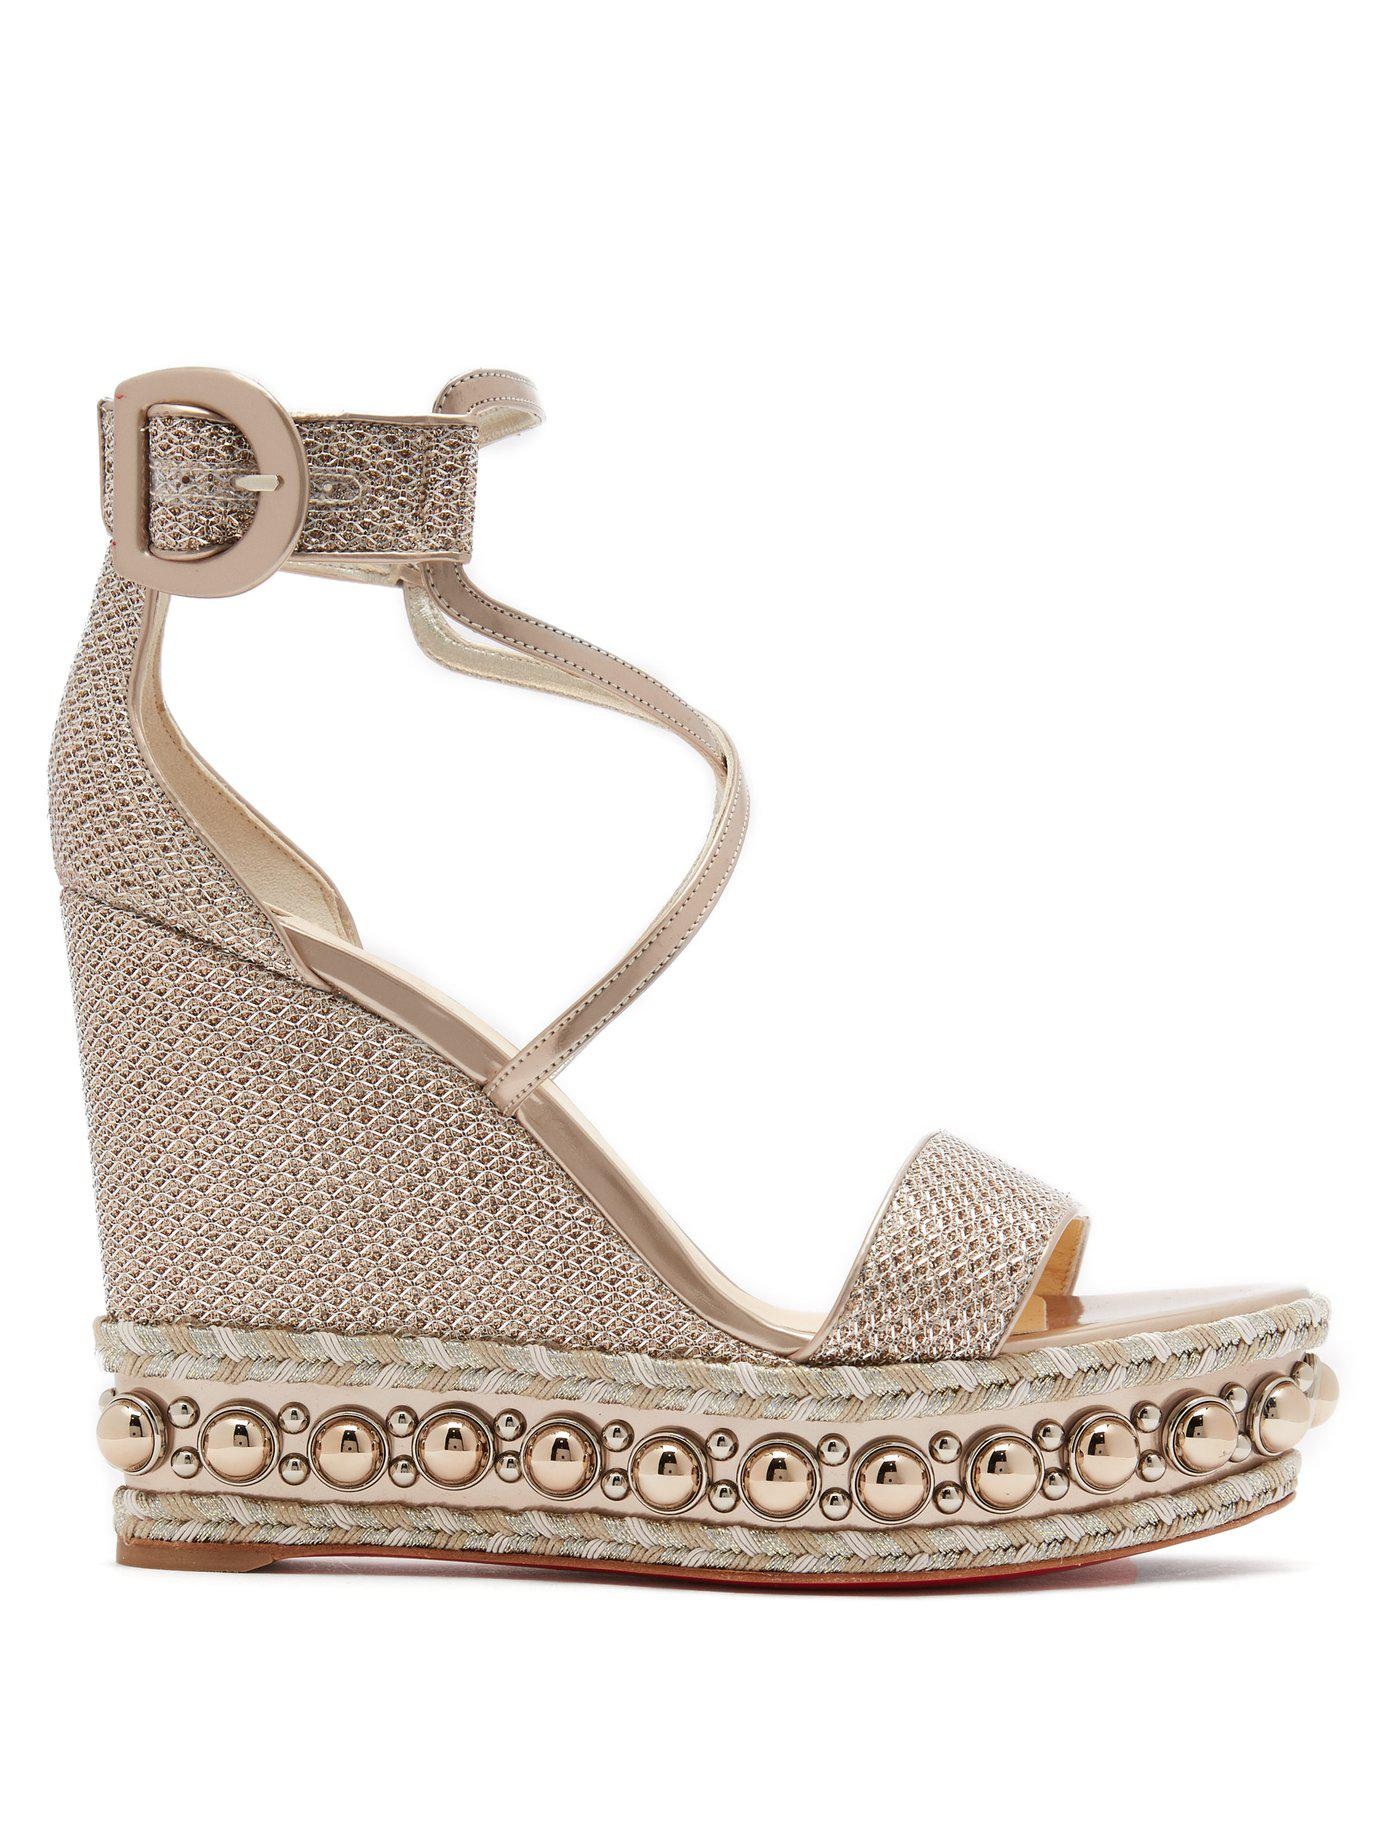 b30cda98bda1 Christian Louboutin. Women s Metallic Chocazeppa 120 Leather Wedge Sandals